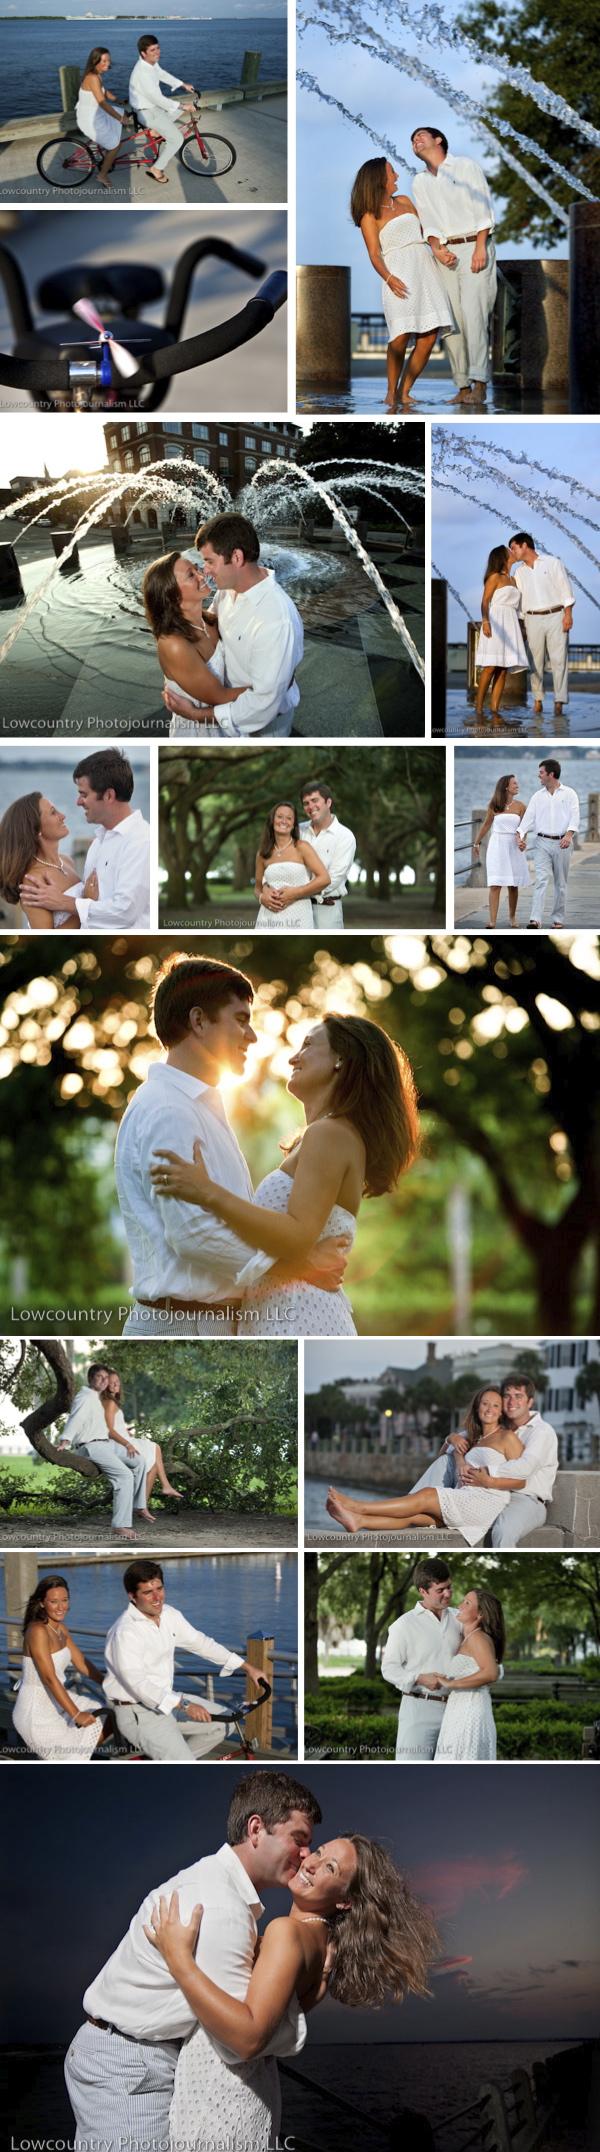 Charleston wedding resource